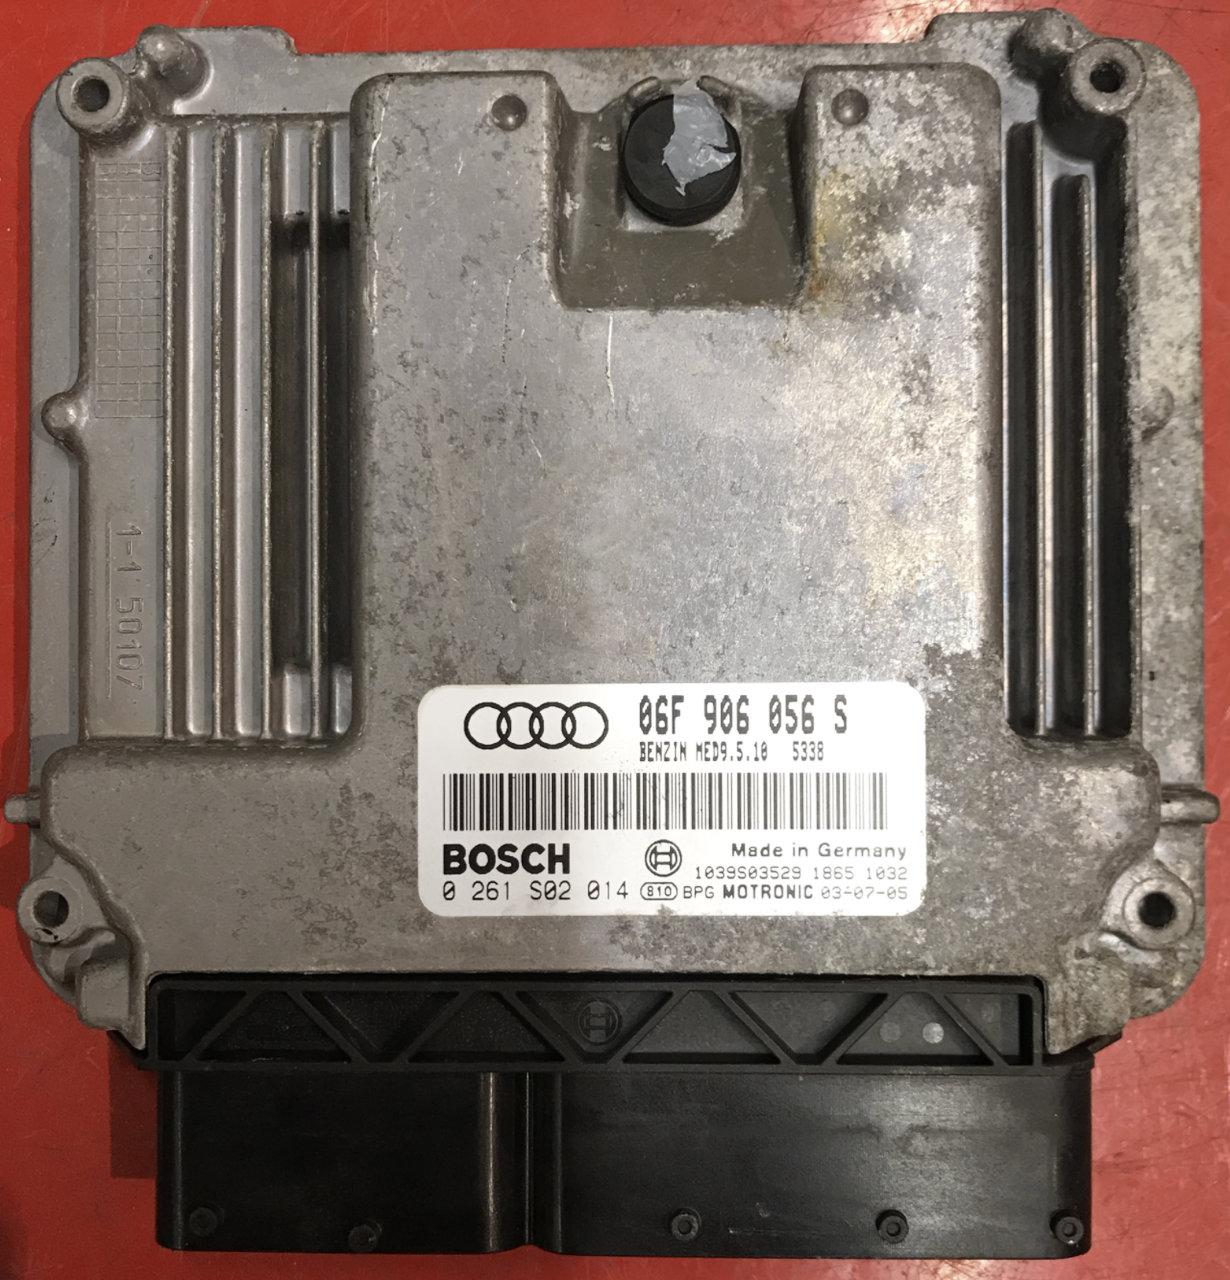 Plug & Play Bosch Engine ECU, Audi 2 0 Fsi 0261S02014, 0 261 S02 014,  06F906056S, 06F 906 056 S, MED9 5 10